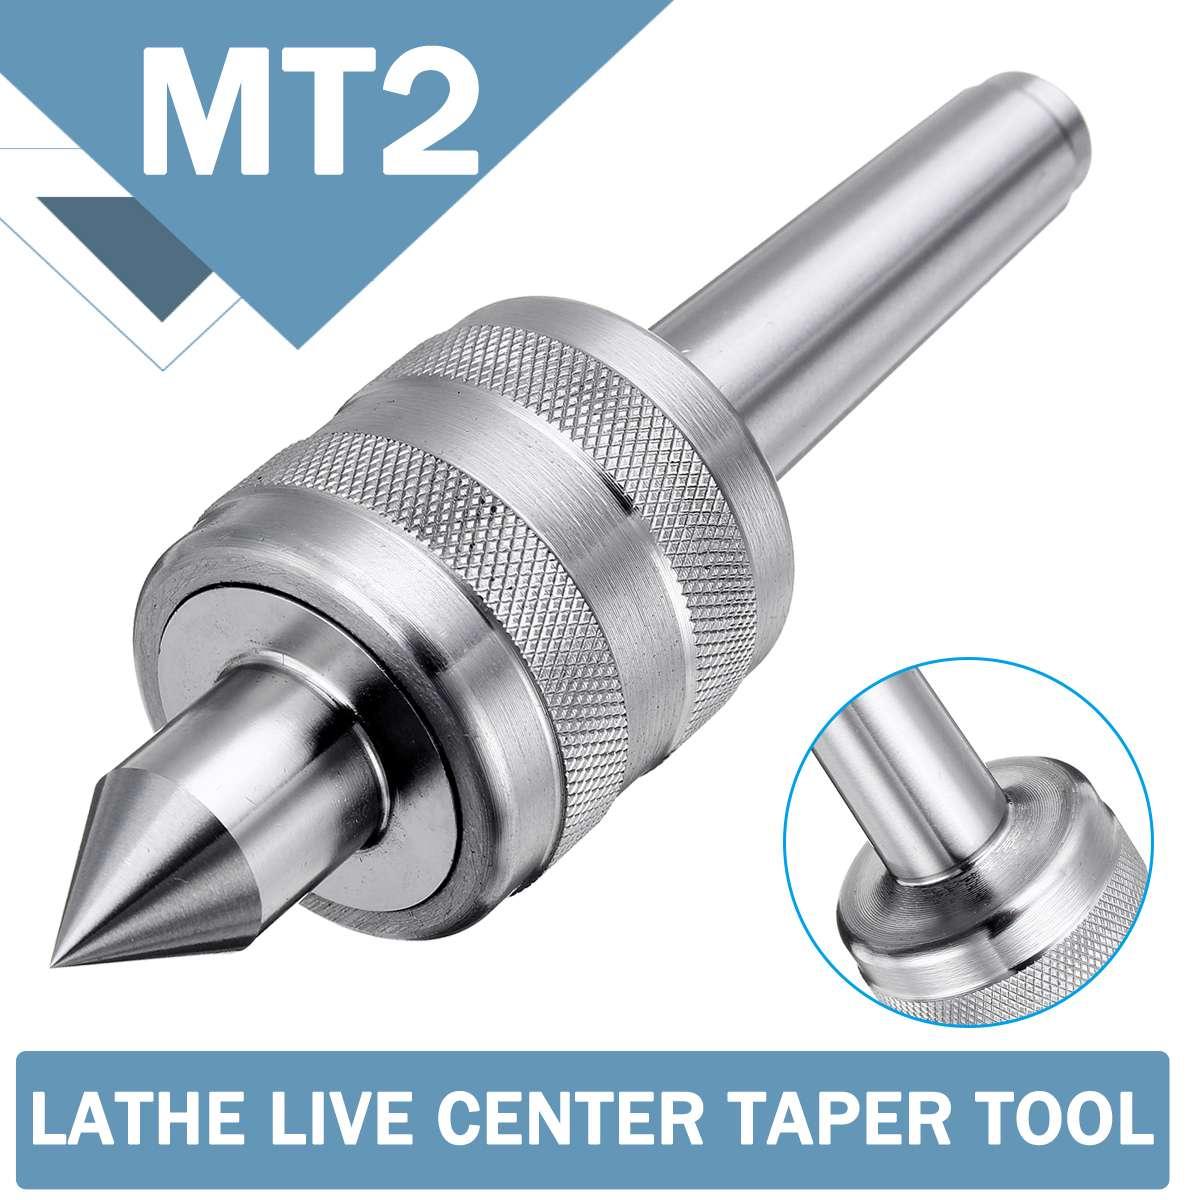 New Accuracy Steel Silver MT2 0.001 Lathe Live Center Taper Tool Live Revolving Milling Center Taper Machine Accessories